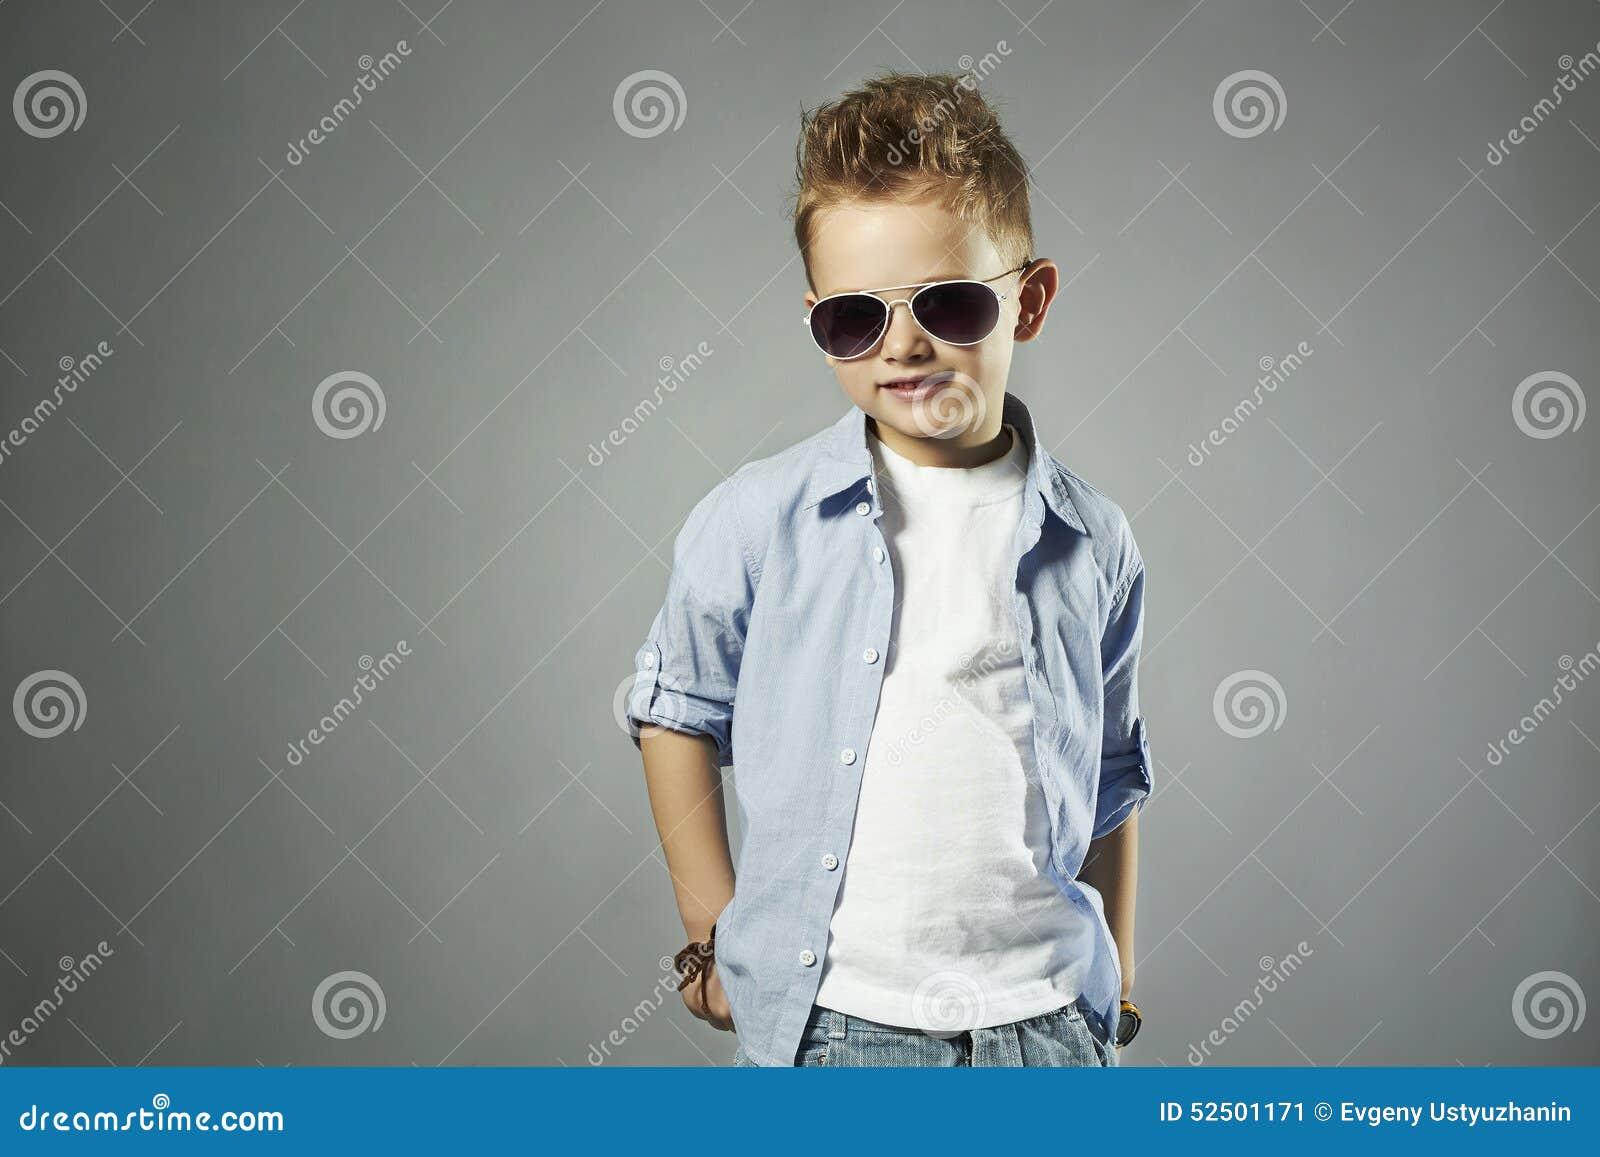 petit gar on la mode dans des lunettes de soleil enfant. Black Bedroom Furniture Sets. Home Design Ideas